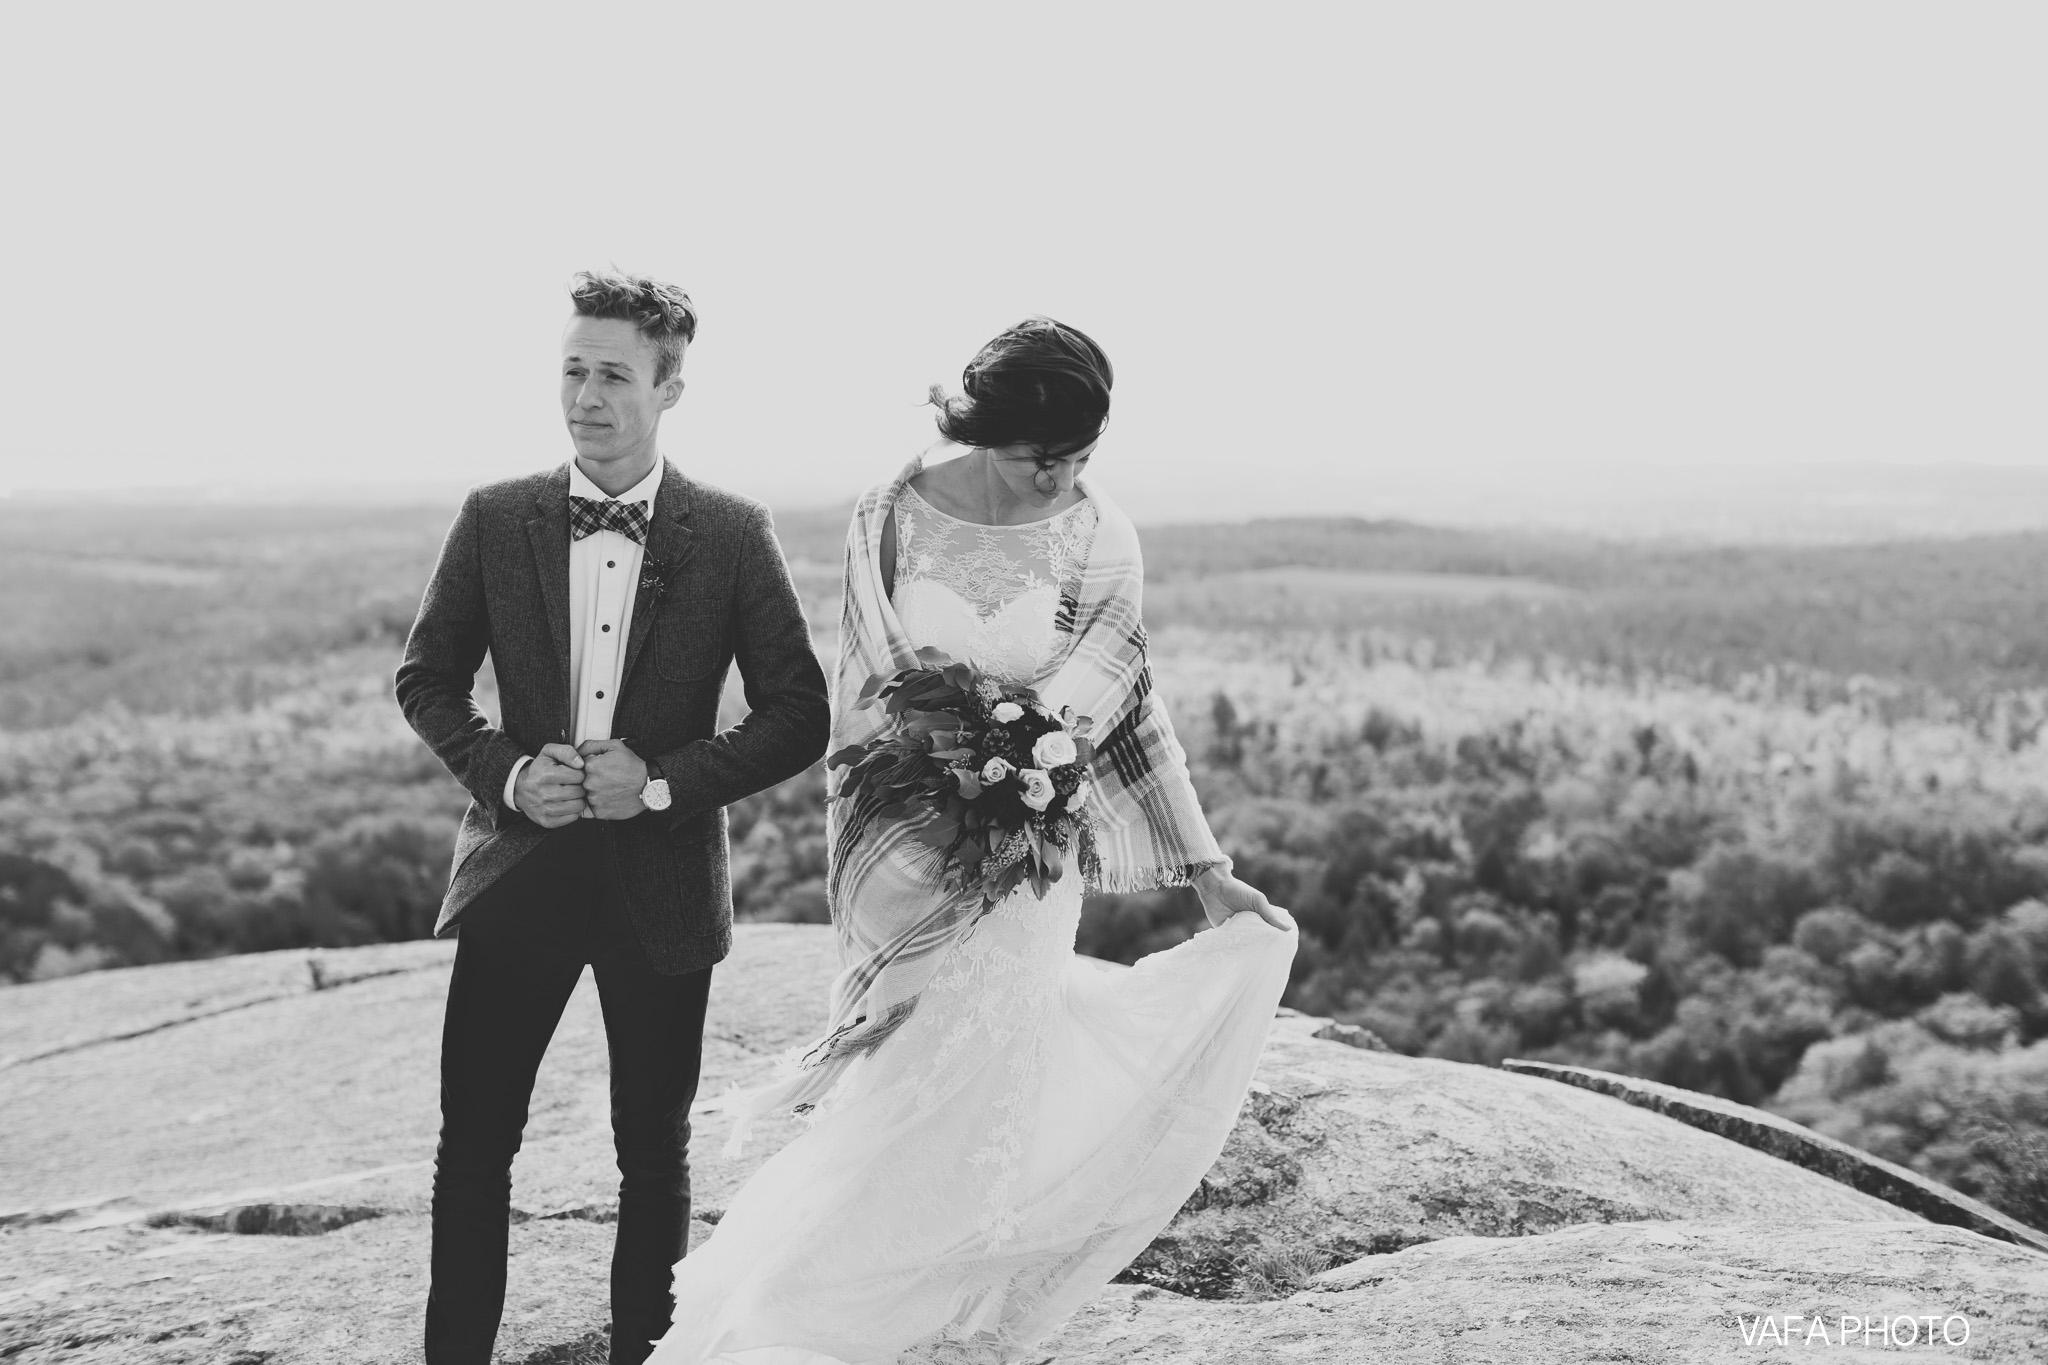 Hogback-Mountain-Wedding-Chelsea-Josh-Vafa-Photo-425.jpg